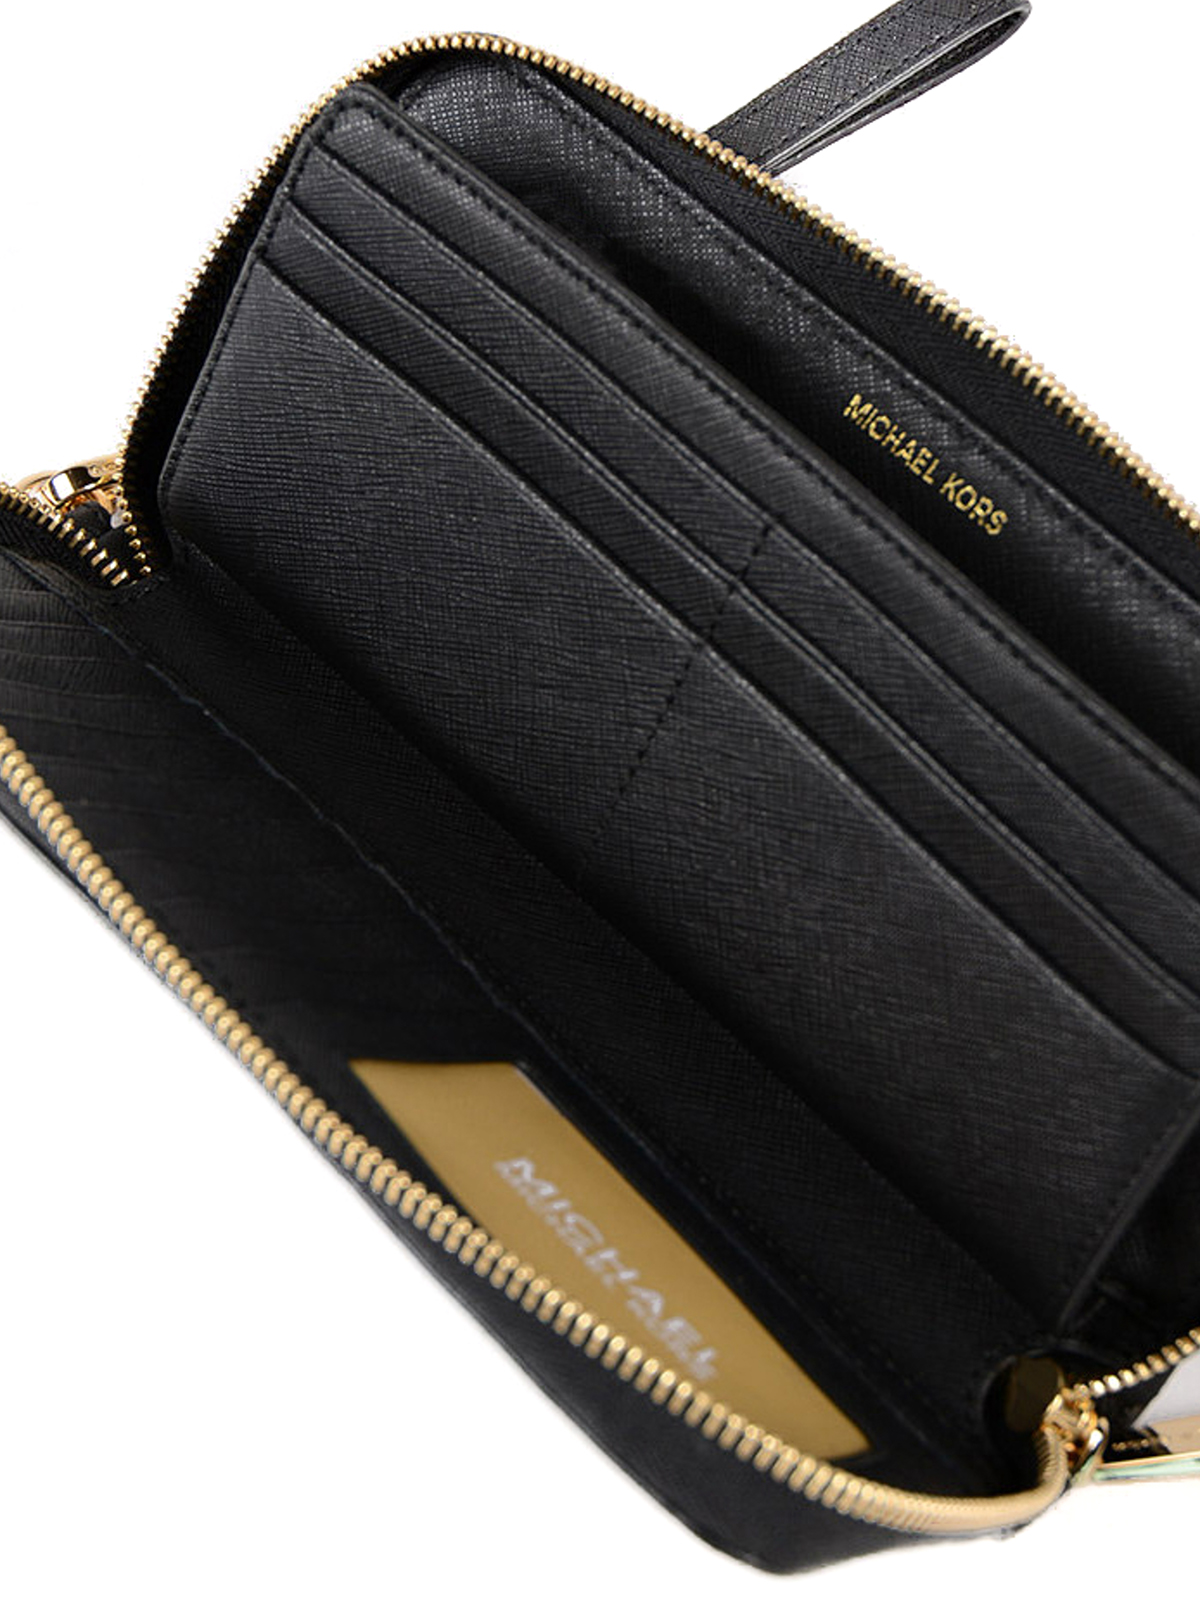 5bf031d0c4cd MICHAEL KORS buy online Jet Set Travel black wallet. MICHAEL KORS: wallets  & purses ...